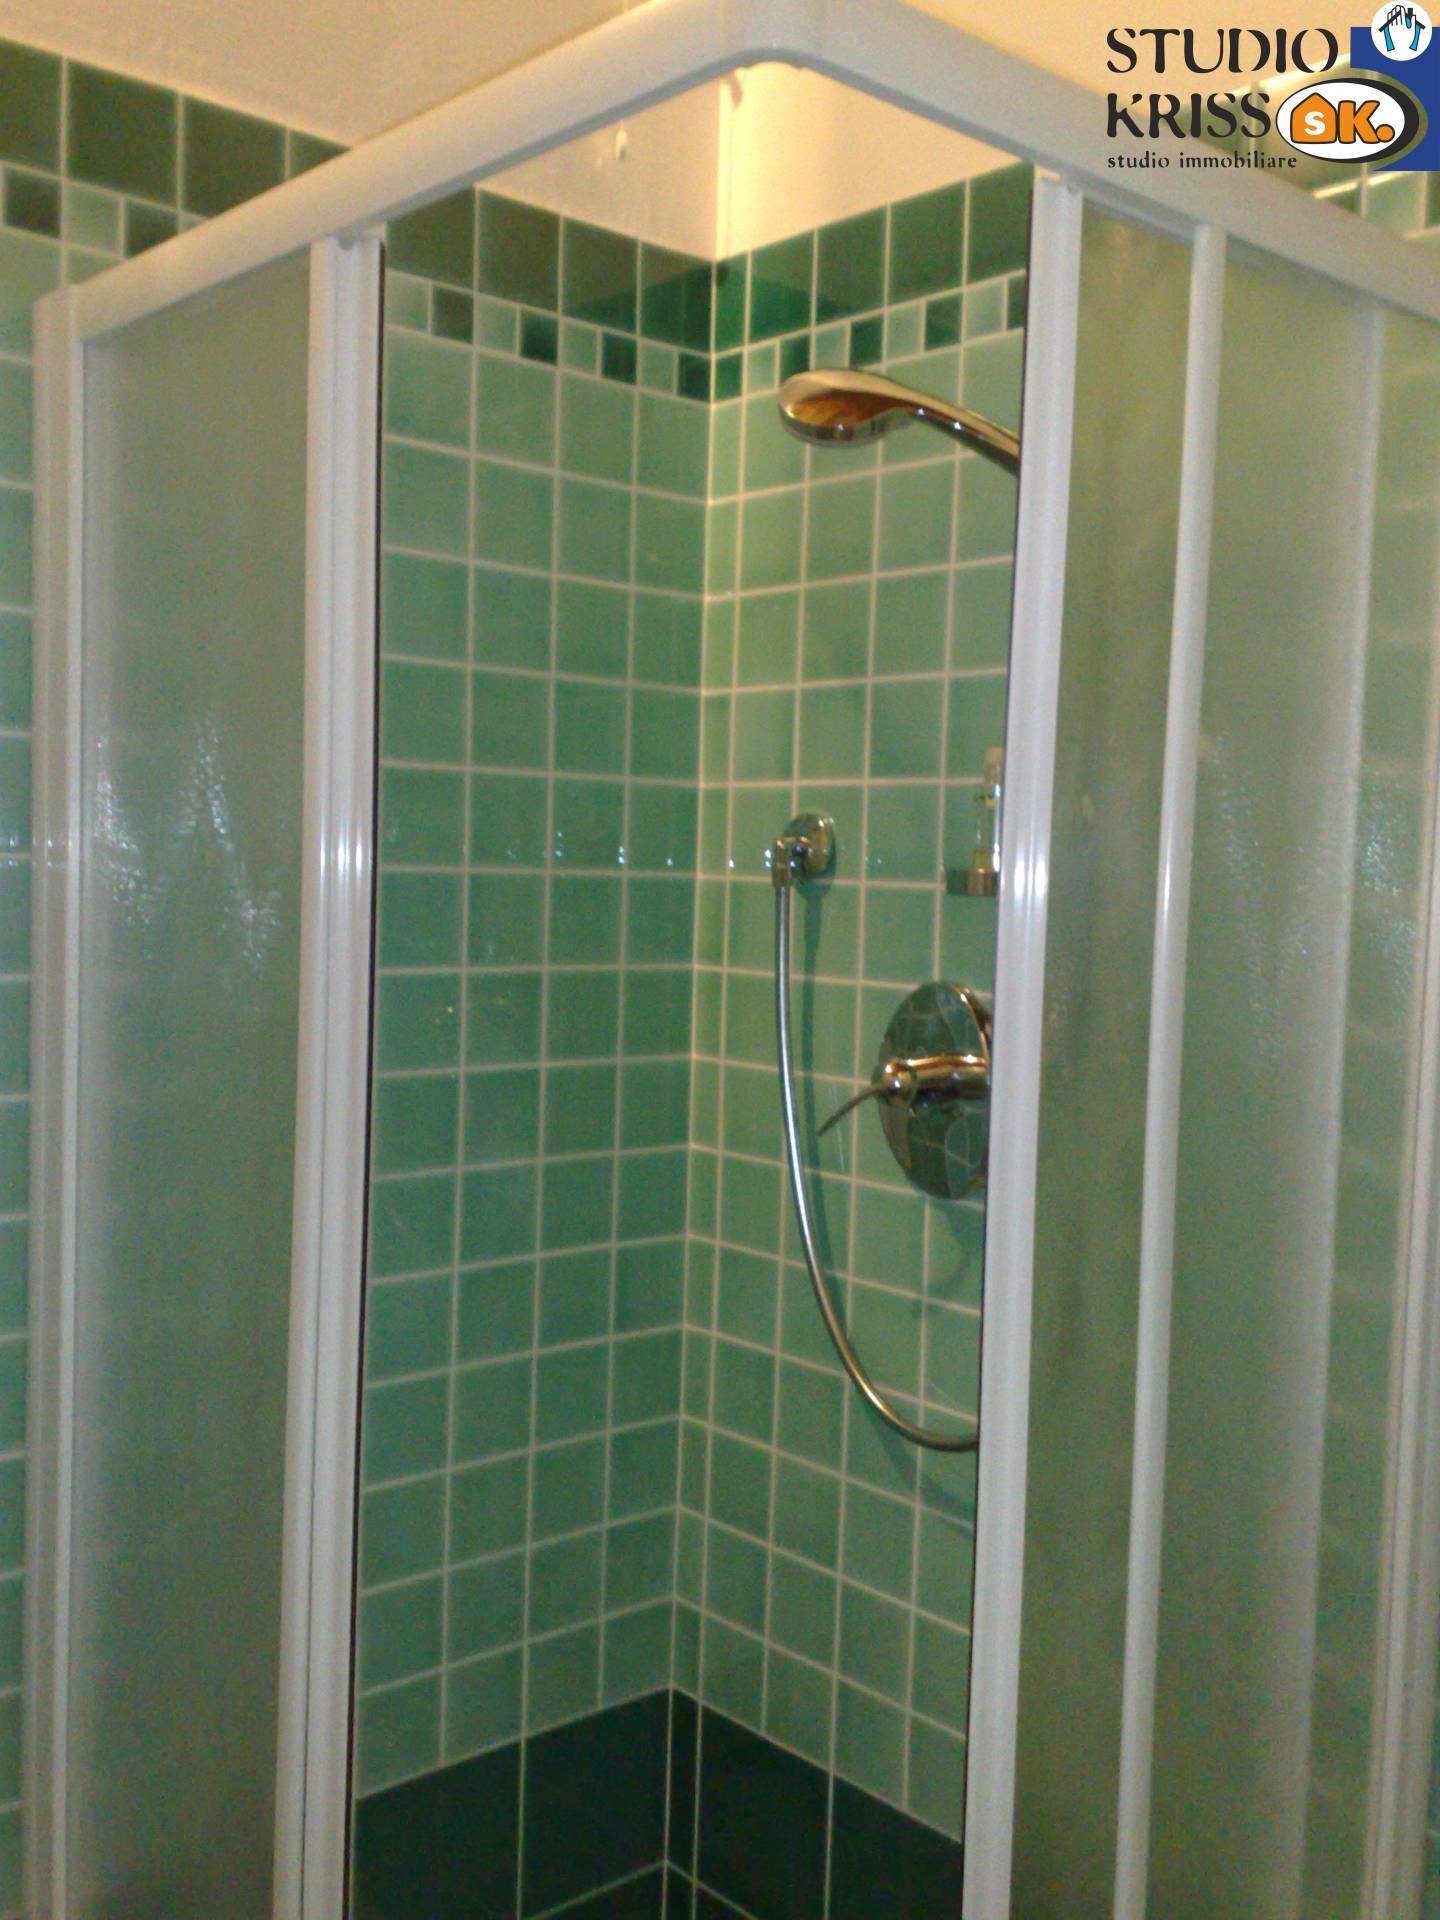 Appartamento in Vendita a Ferrara: 2 locali, 60 mq - Foto 7